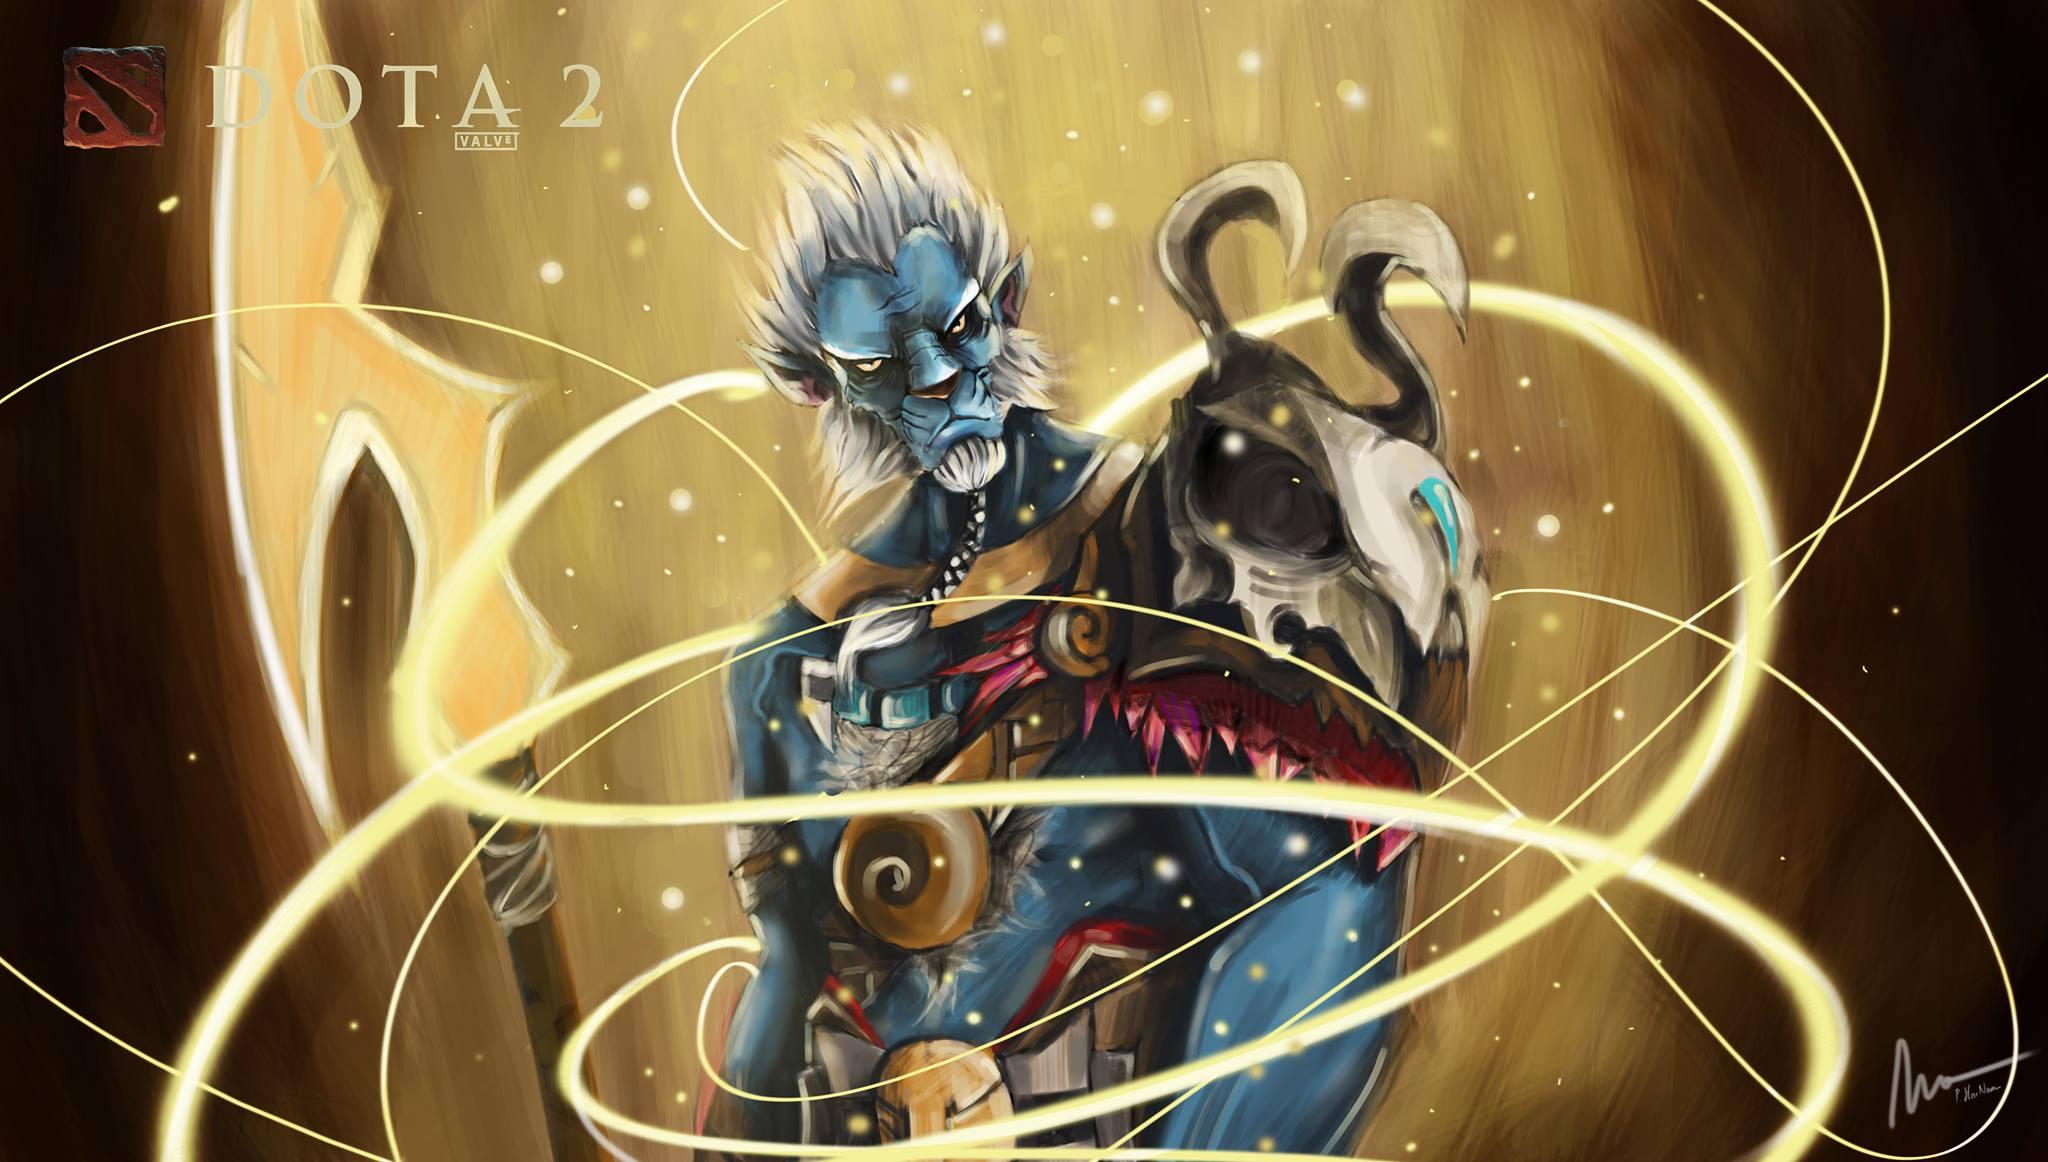 Dota2 : Phantom Lancer Wallpapers hd